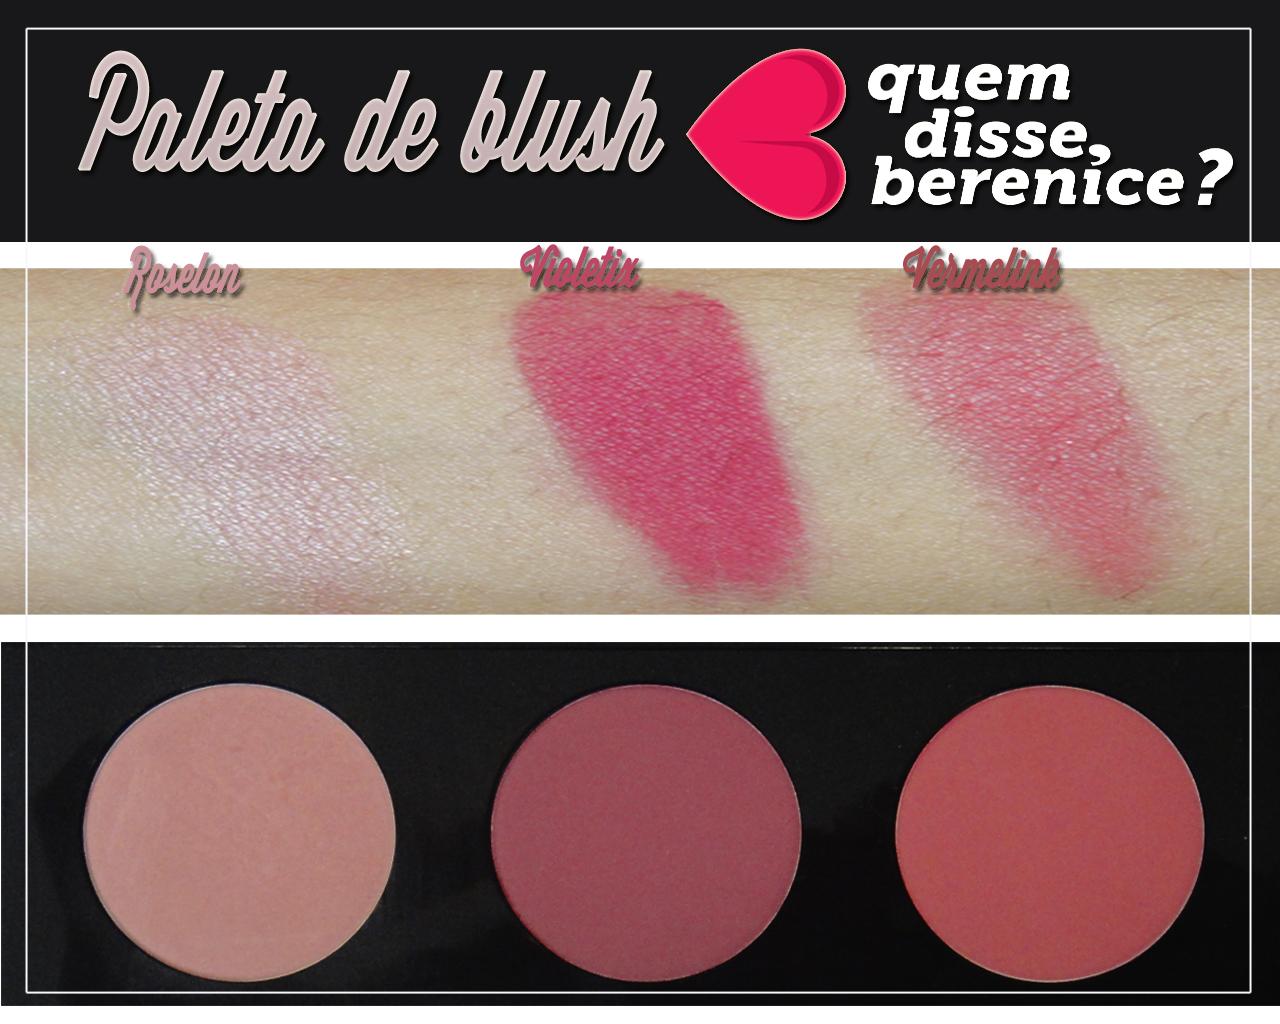 paleta-blush-quem-disse-berenice-resenha-swatch